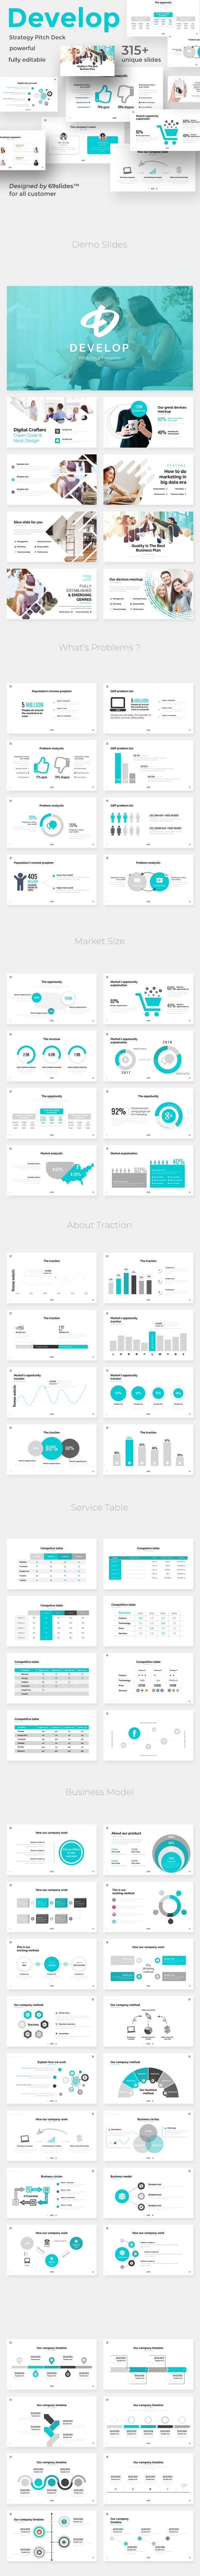 Develop Strategy Pitch Deck Keynote Template - Business Keynote Templates